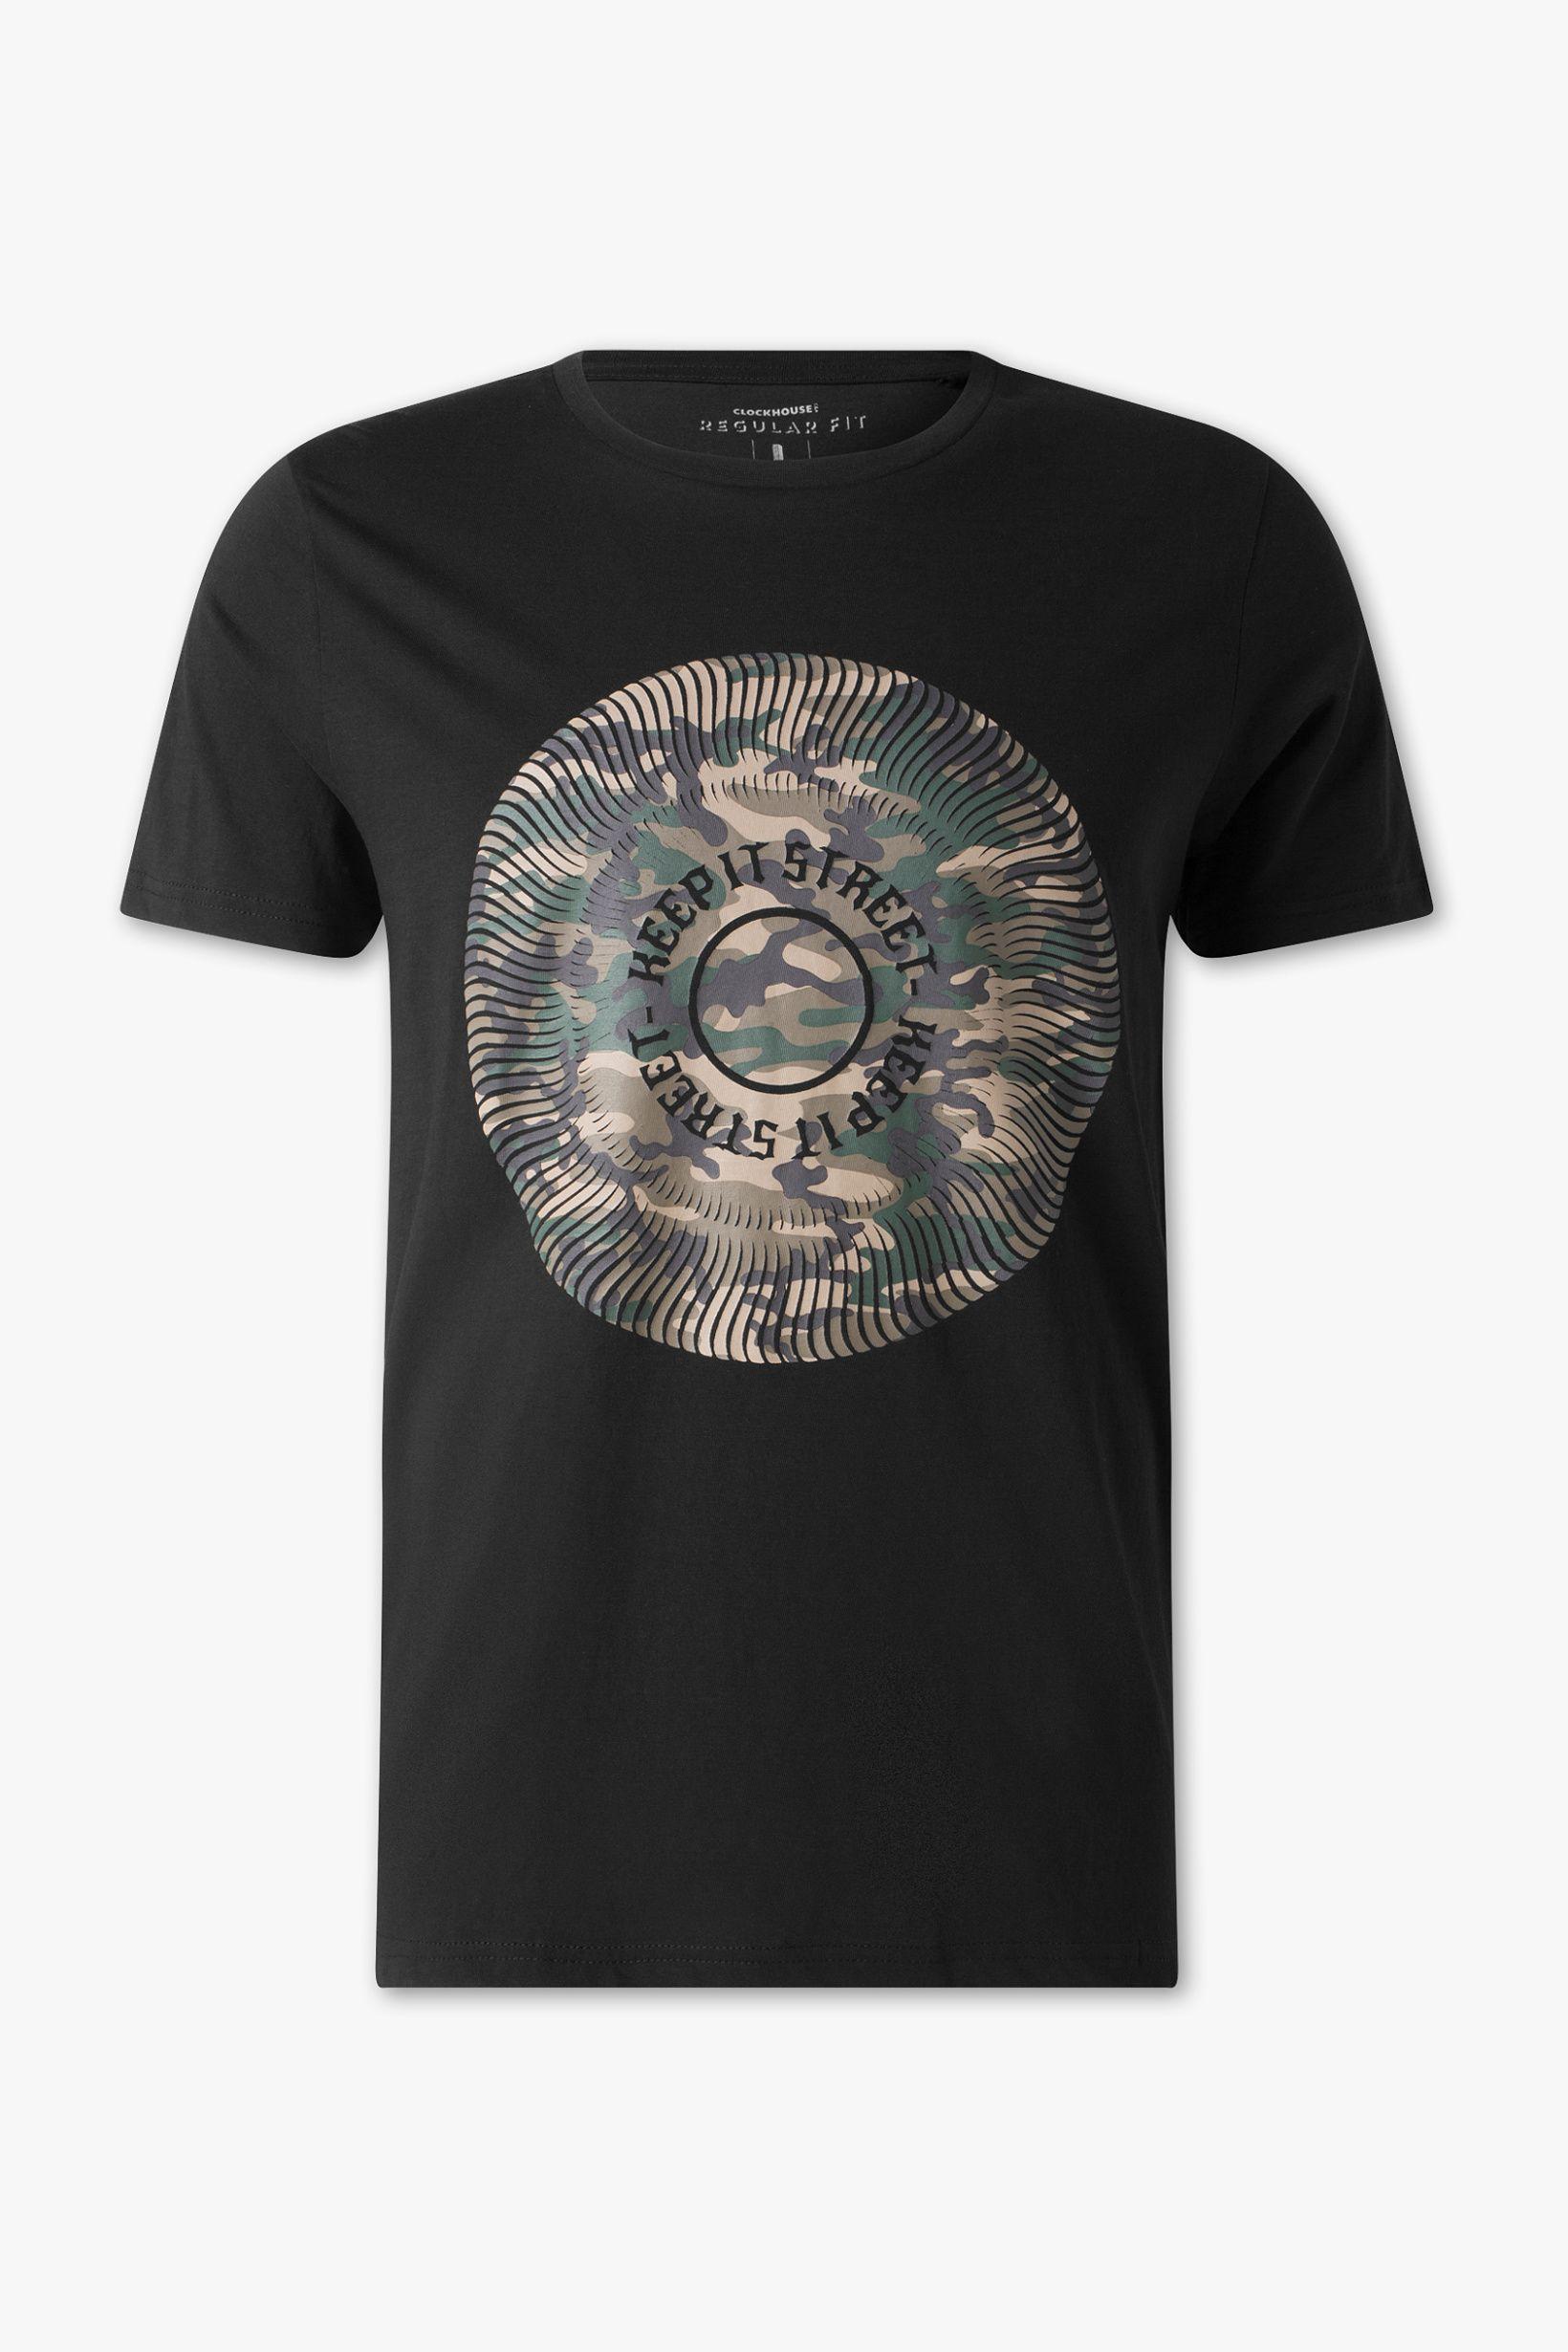 2dc96d629 T-Shirt - Regular Fit - Bio-Baumwolle | www.davidemartini.ink x clockhouse